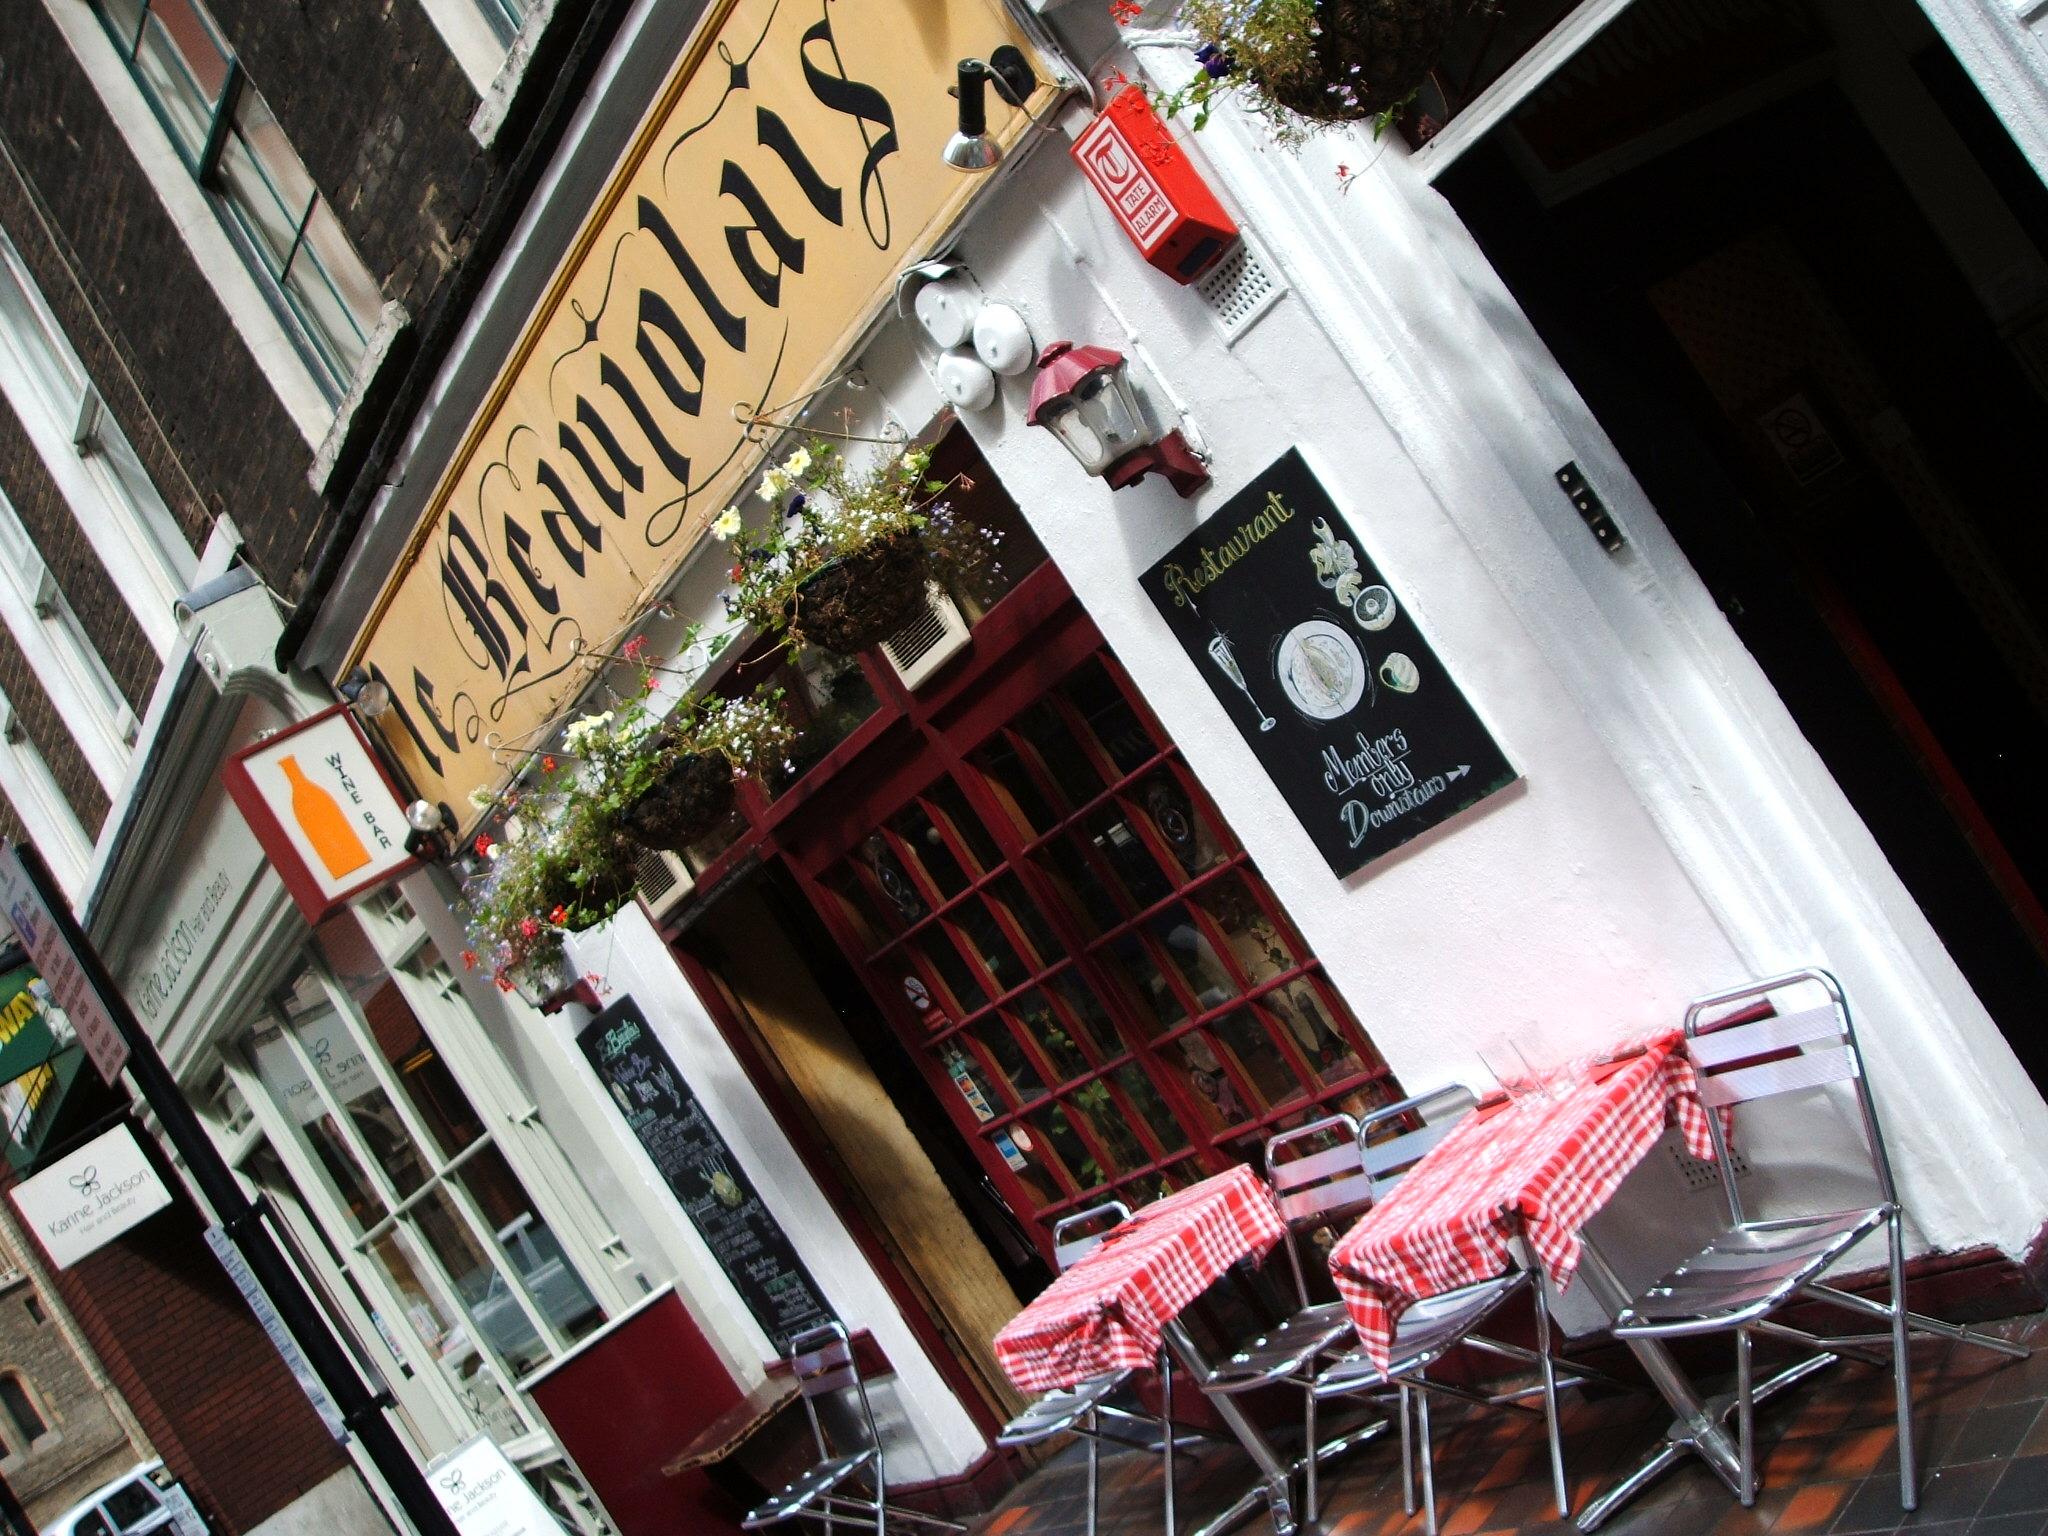 Le Beaujolais London